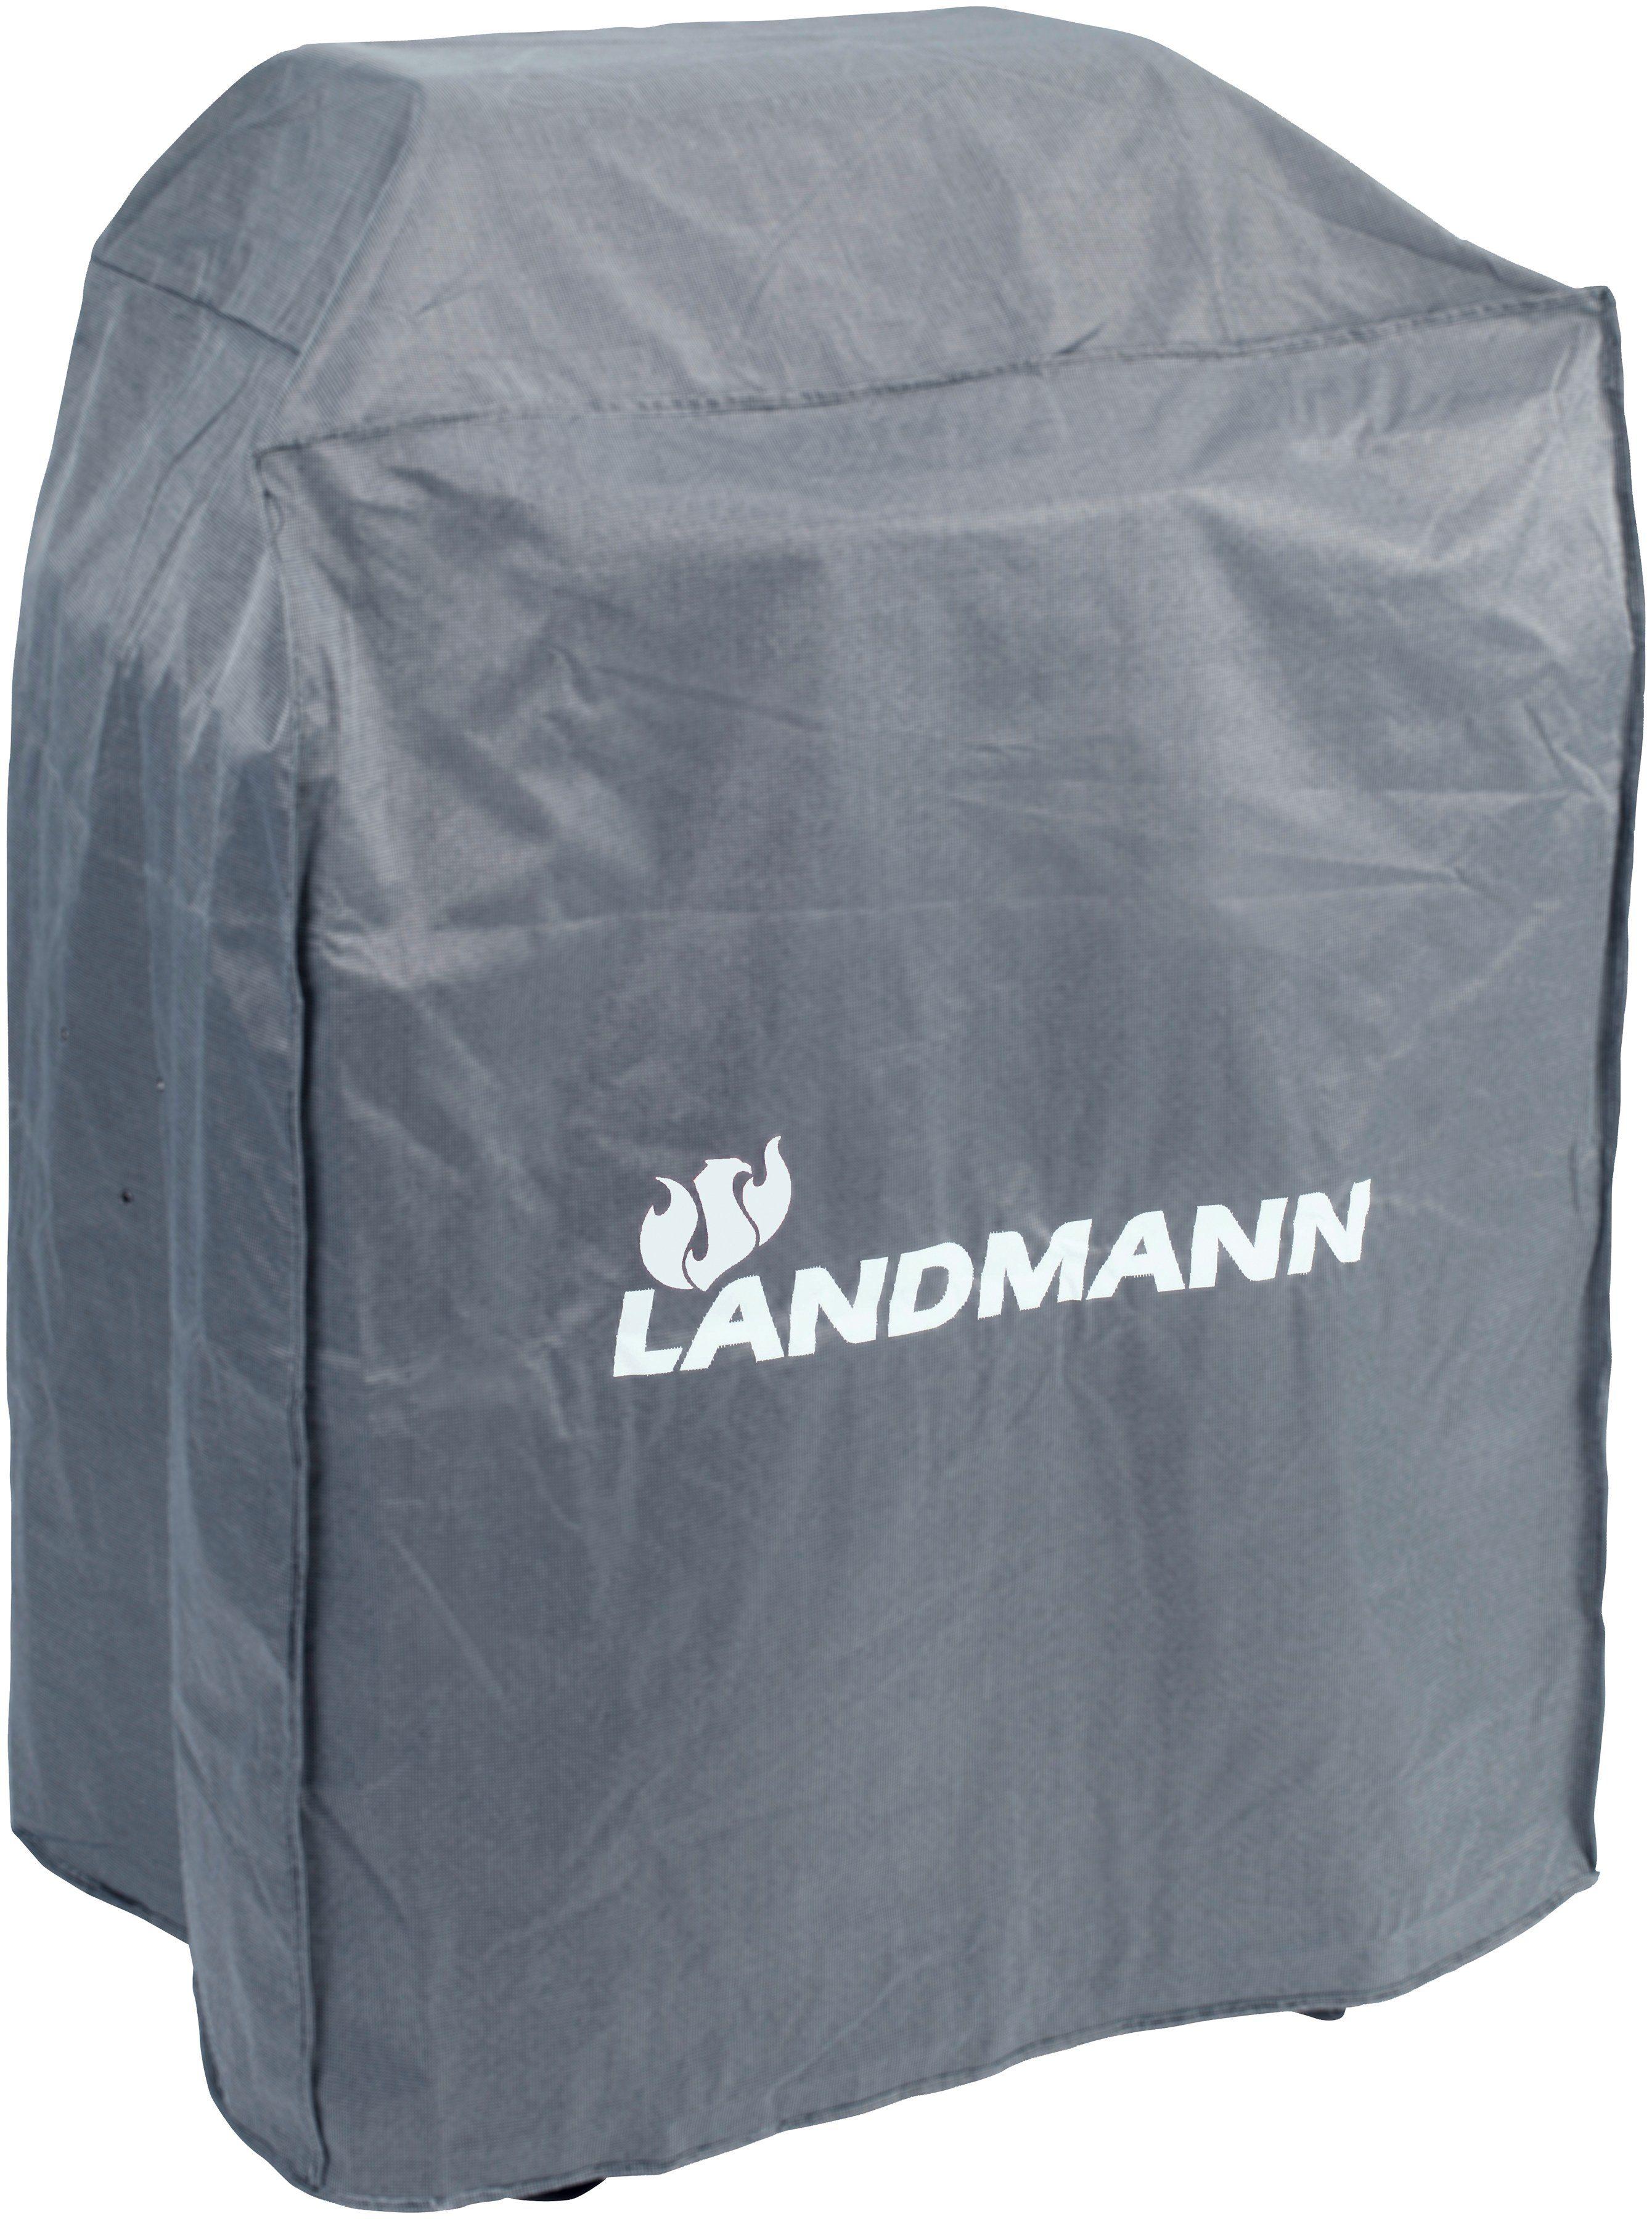 LANDMANN Schutzhülle »Premium M«, BxTxH: 80x60x120 cm